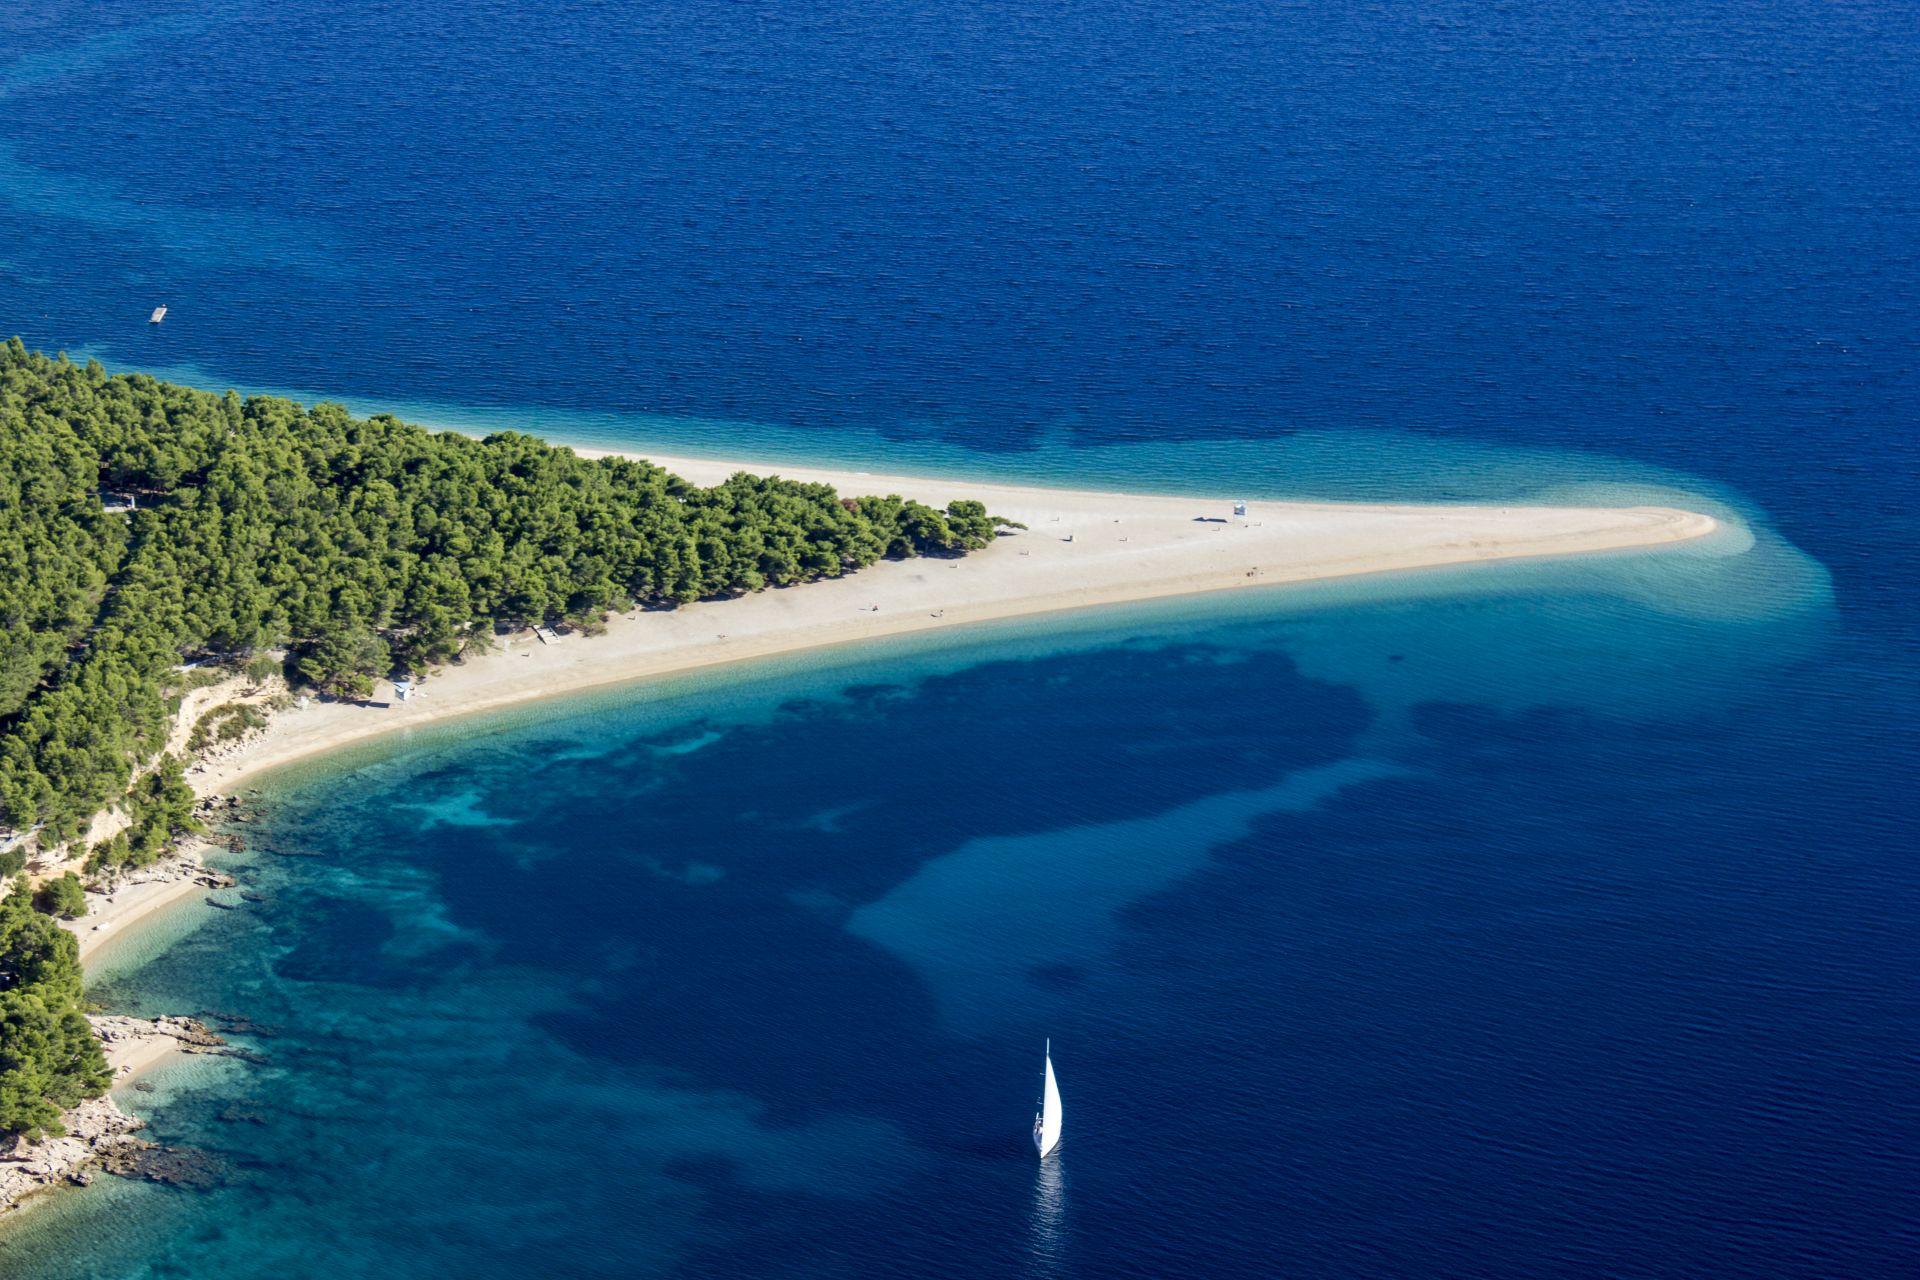 island-of-brac-bol-beach-travelogue-hit-dalmatia-marko-kapitanovic-tz-splitsko-dalmatinske-zupanije